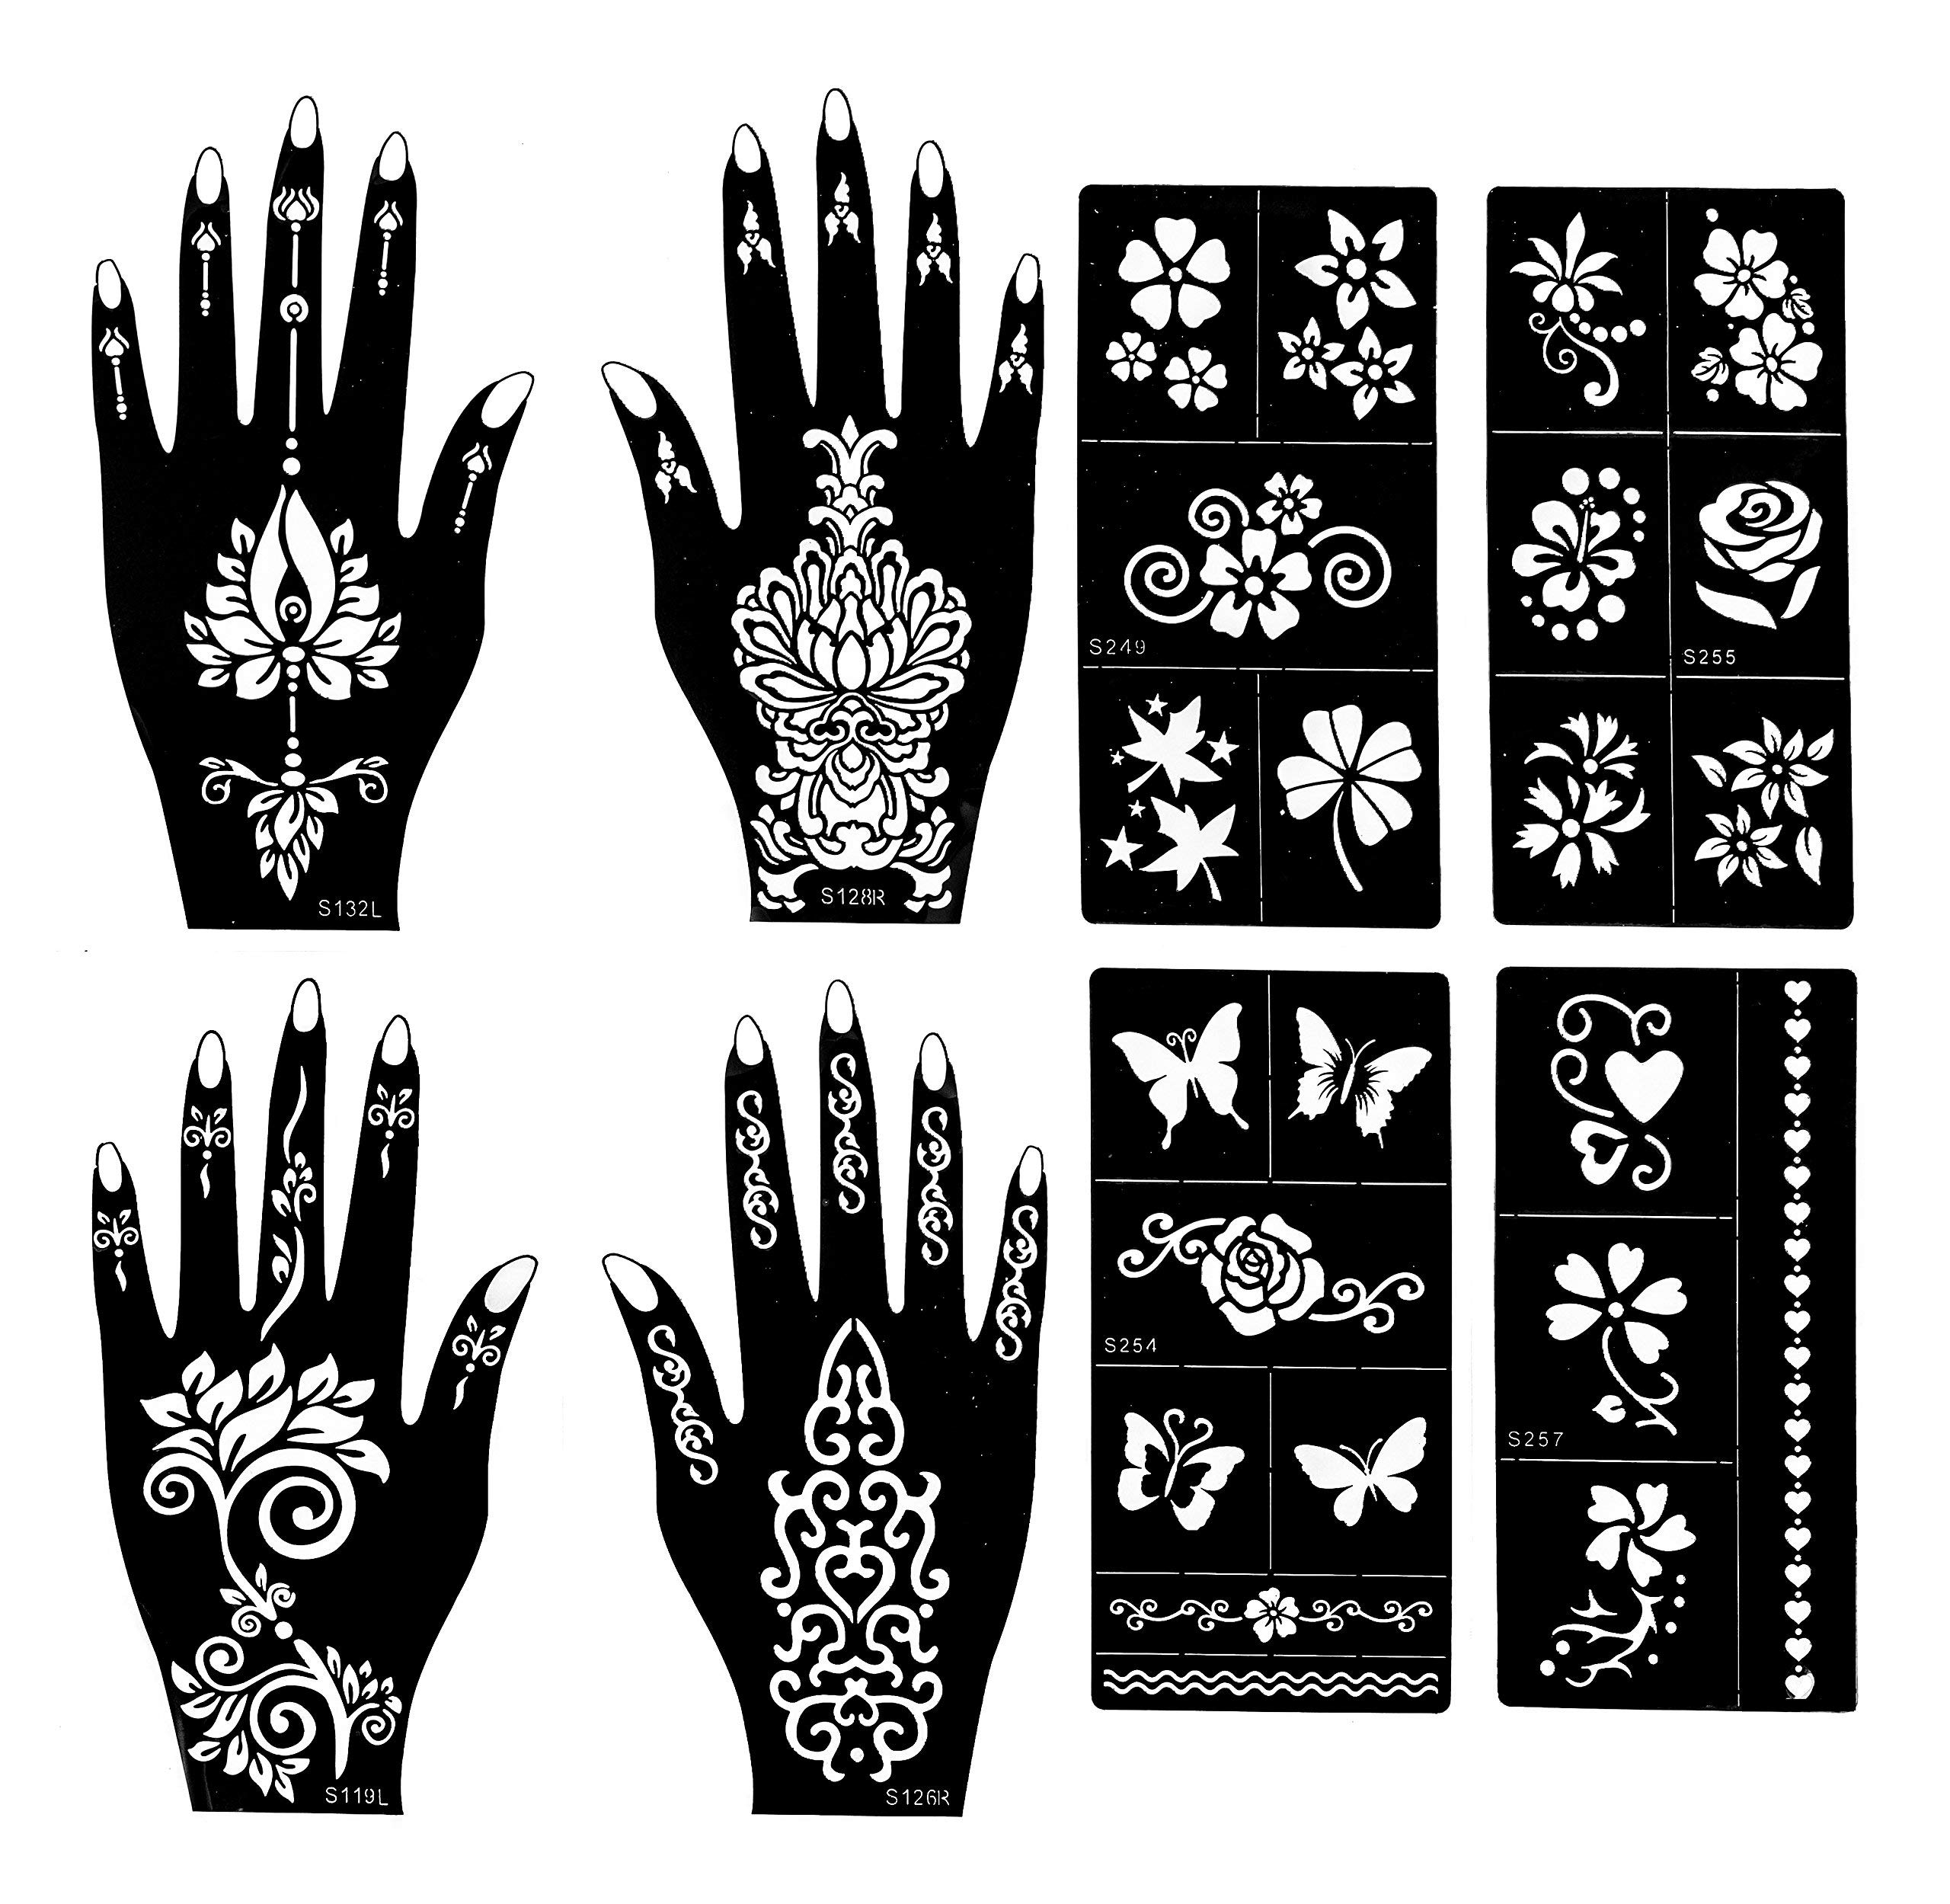 4ef3644c6 Amazon.com : Henna Tattoo Stencils (Pack Of 8) | Henna Tattoo kit | 4  Different Patterns (2 Each Hand) | Tattoo Stencils | Henna Stencils For  Henna Designs ...